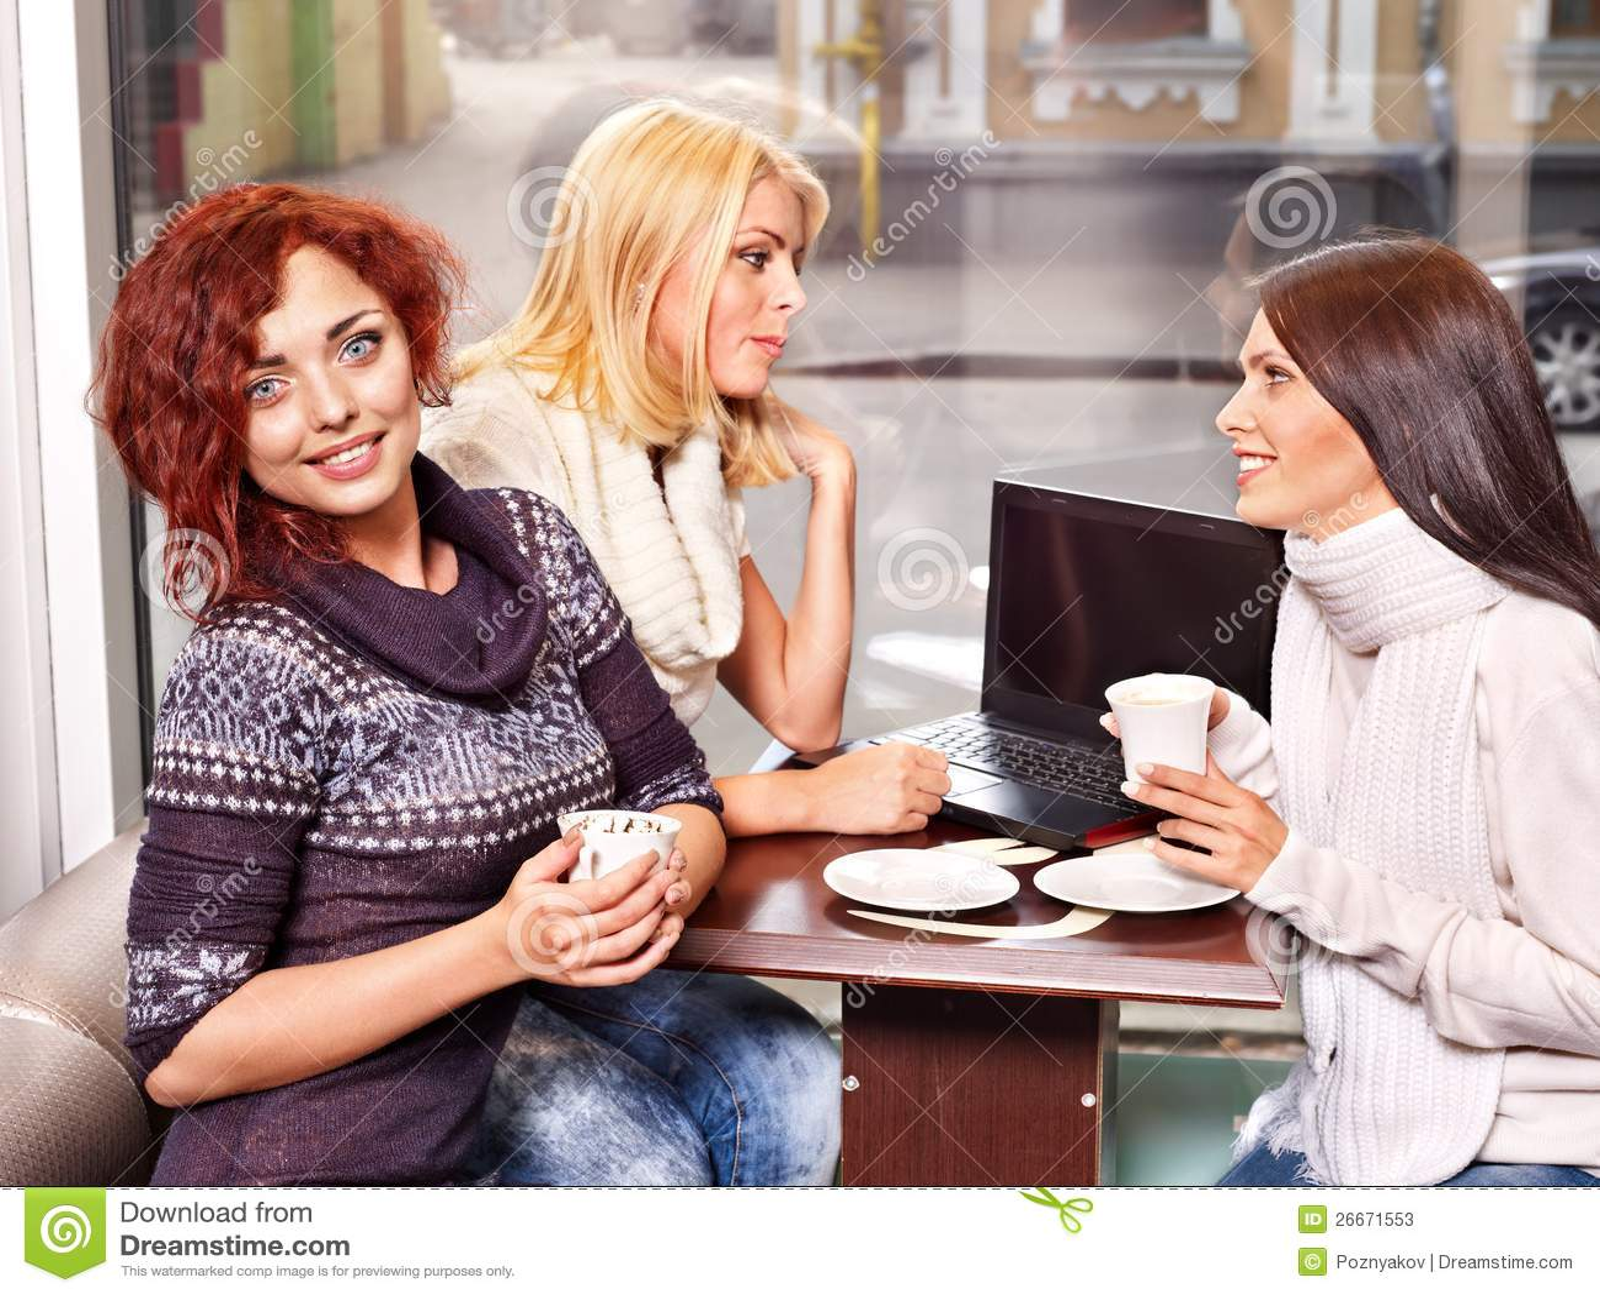 nude girls drink coffee